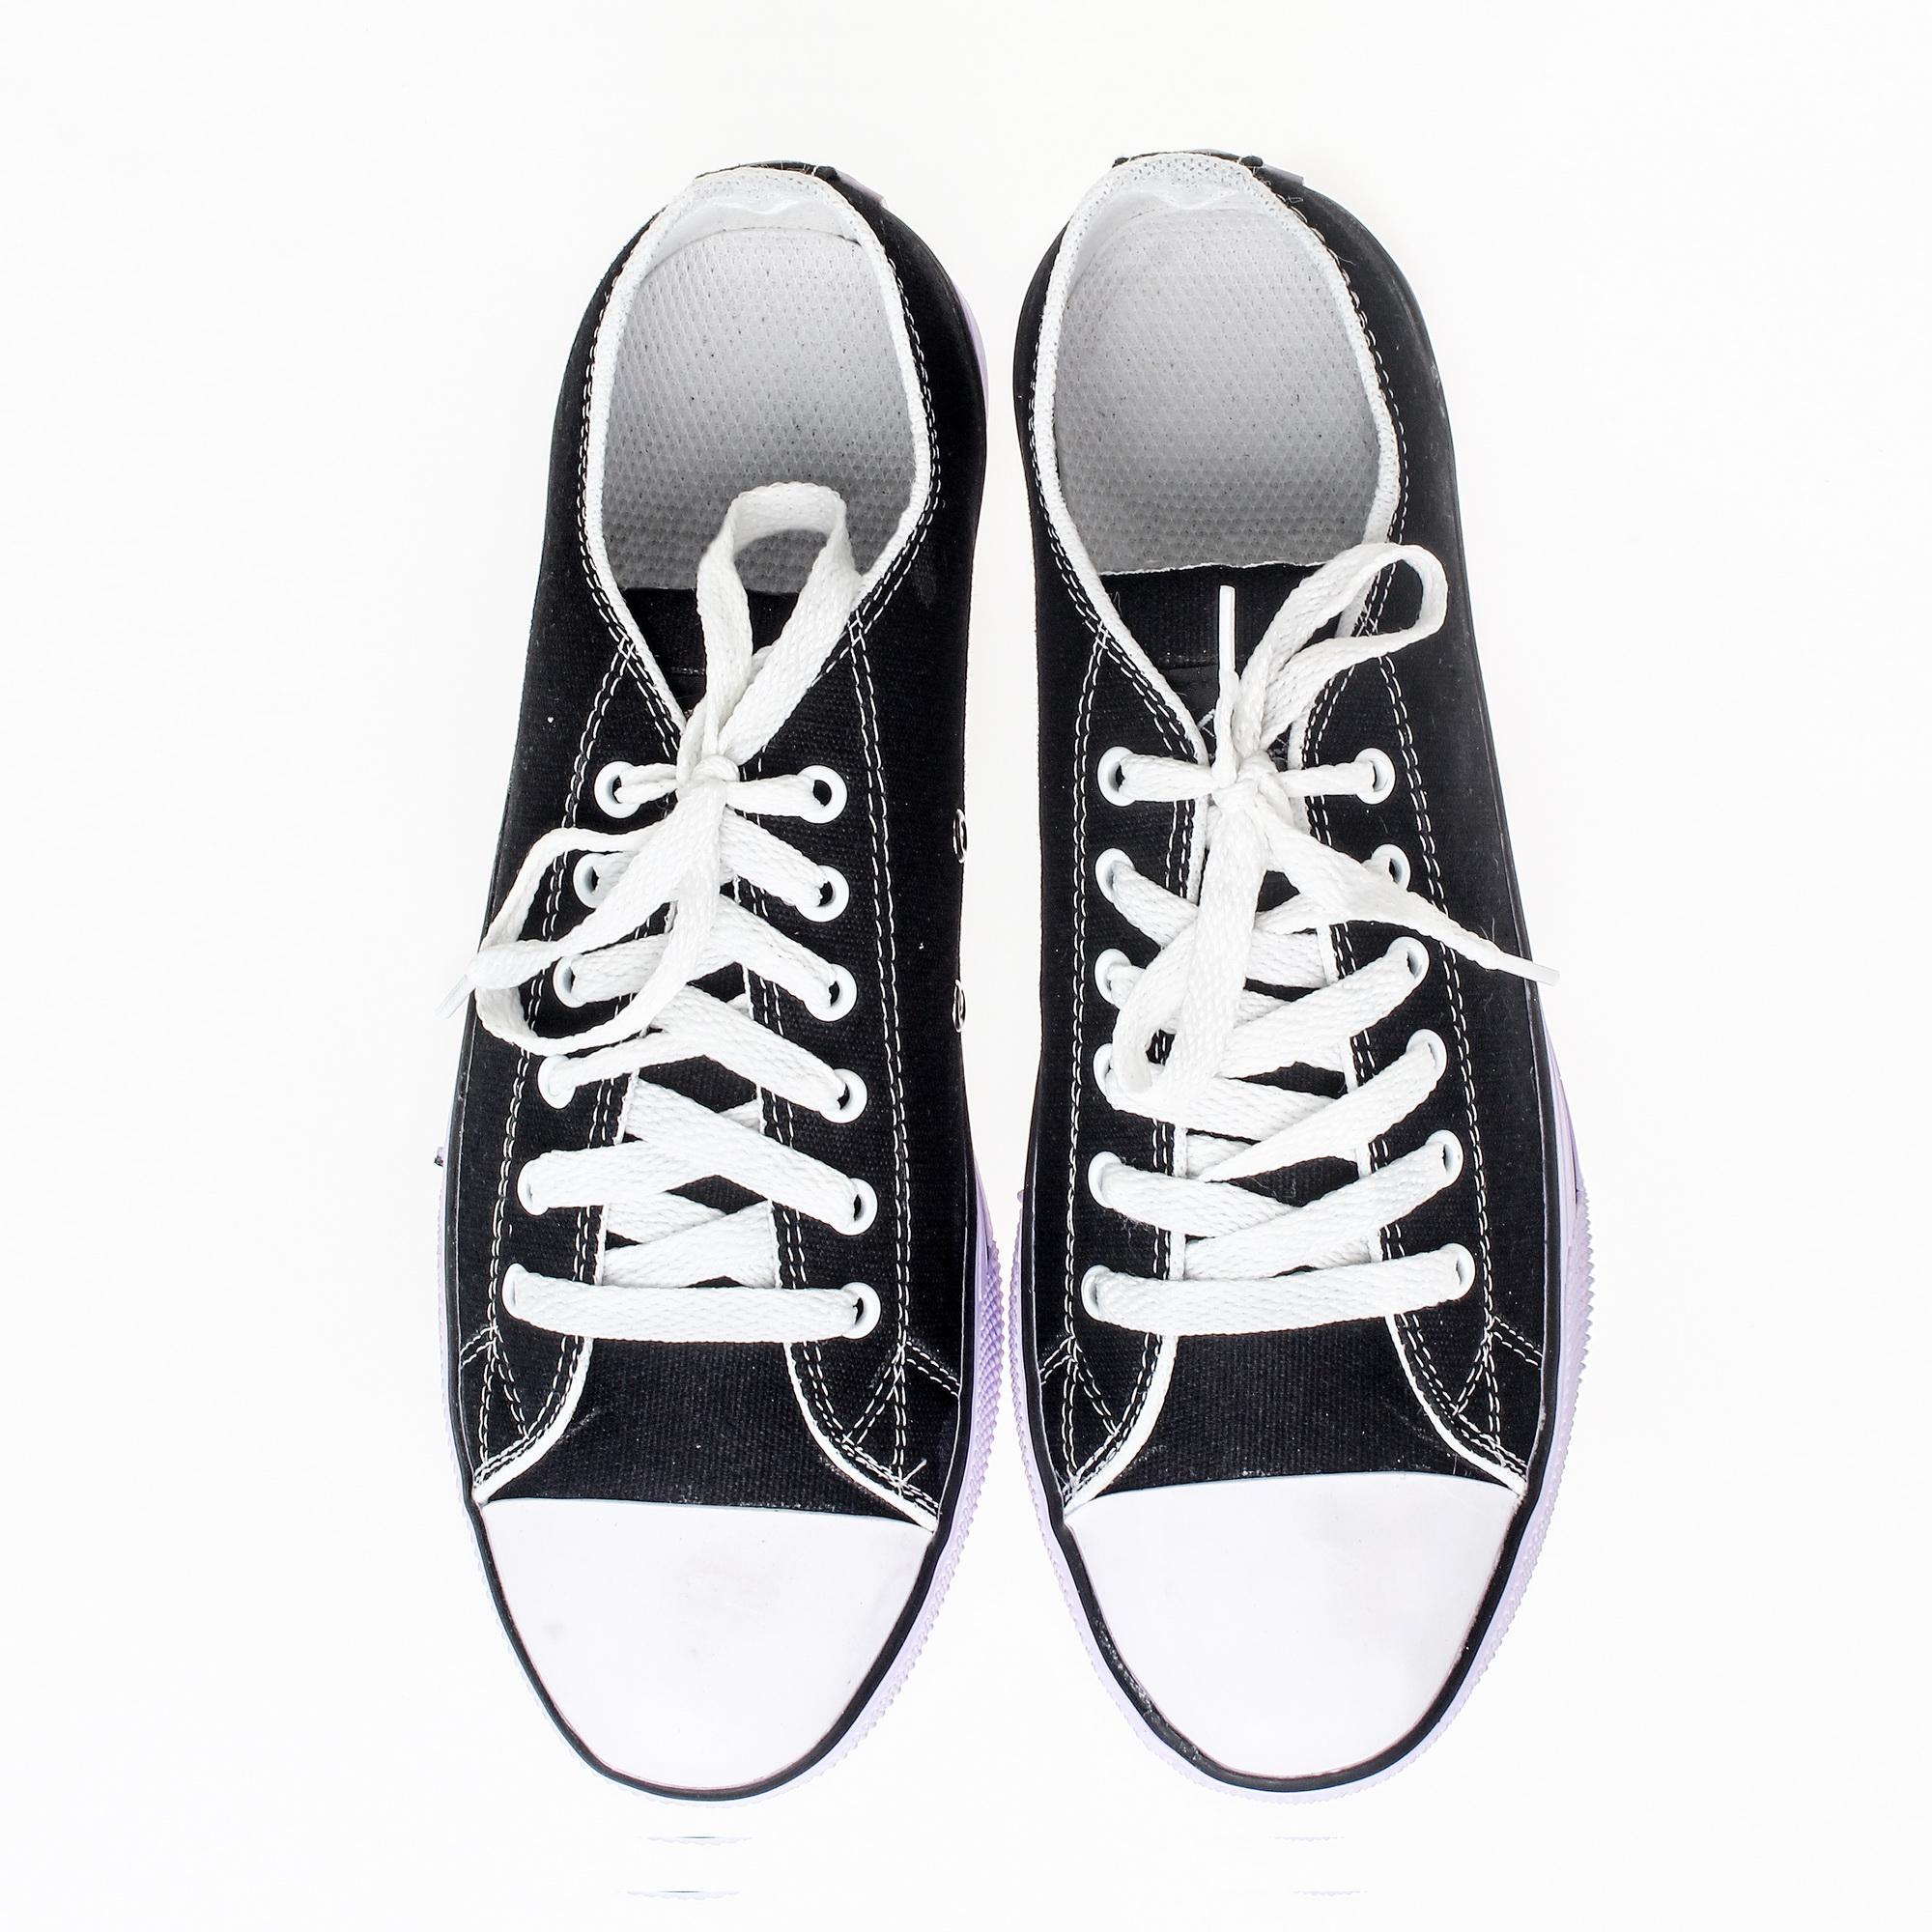 Kaiko   RK Shoes   fashion pria   sepatu   sepatu pria   flat shoes   be326876d3